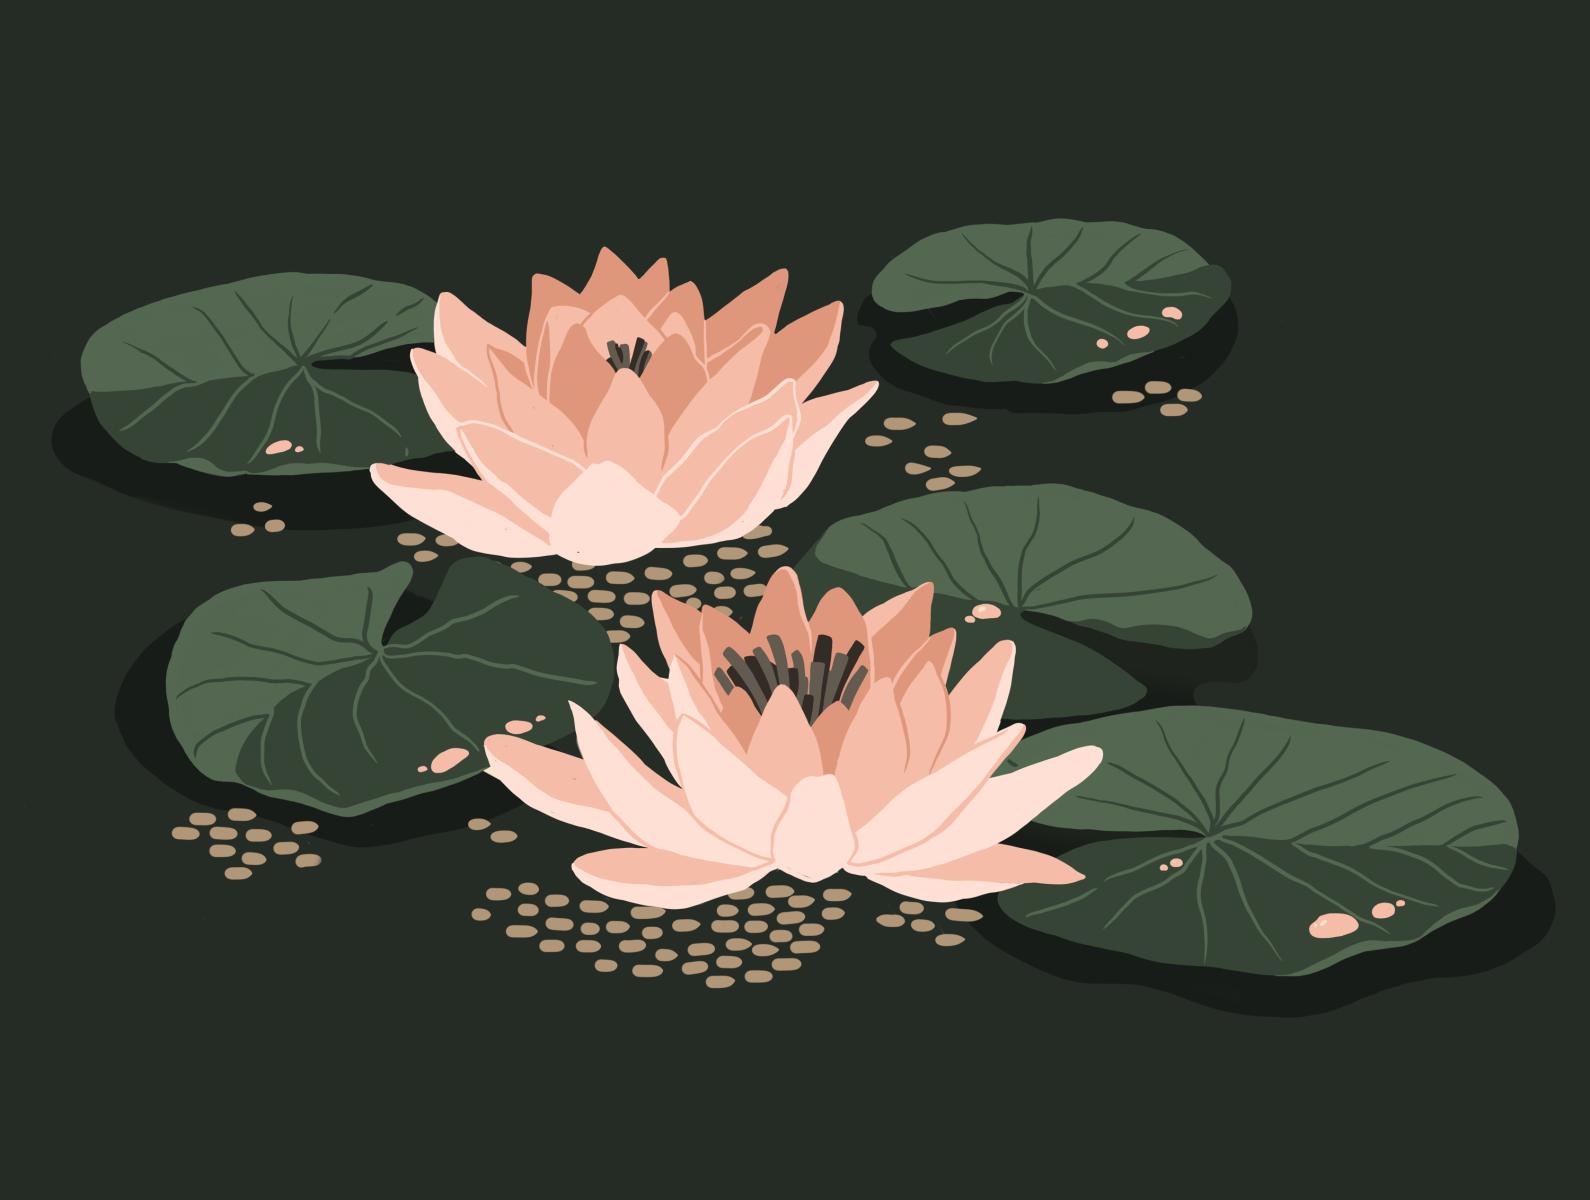 Water lily by maria shanina